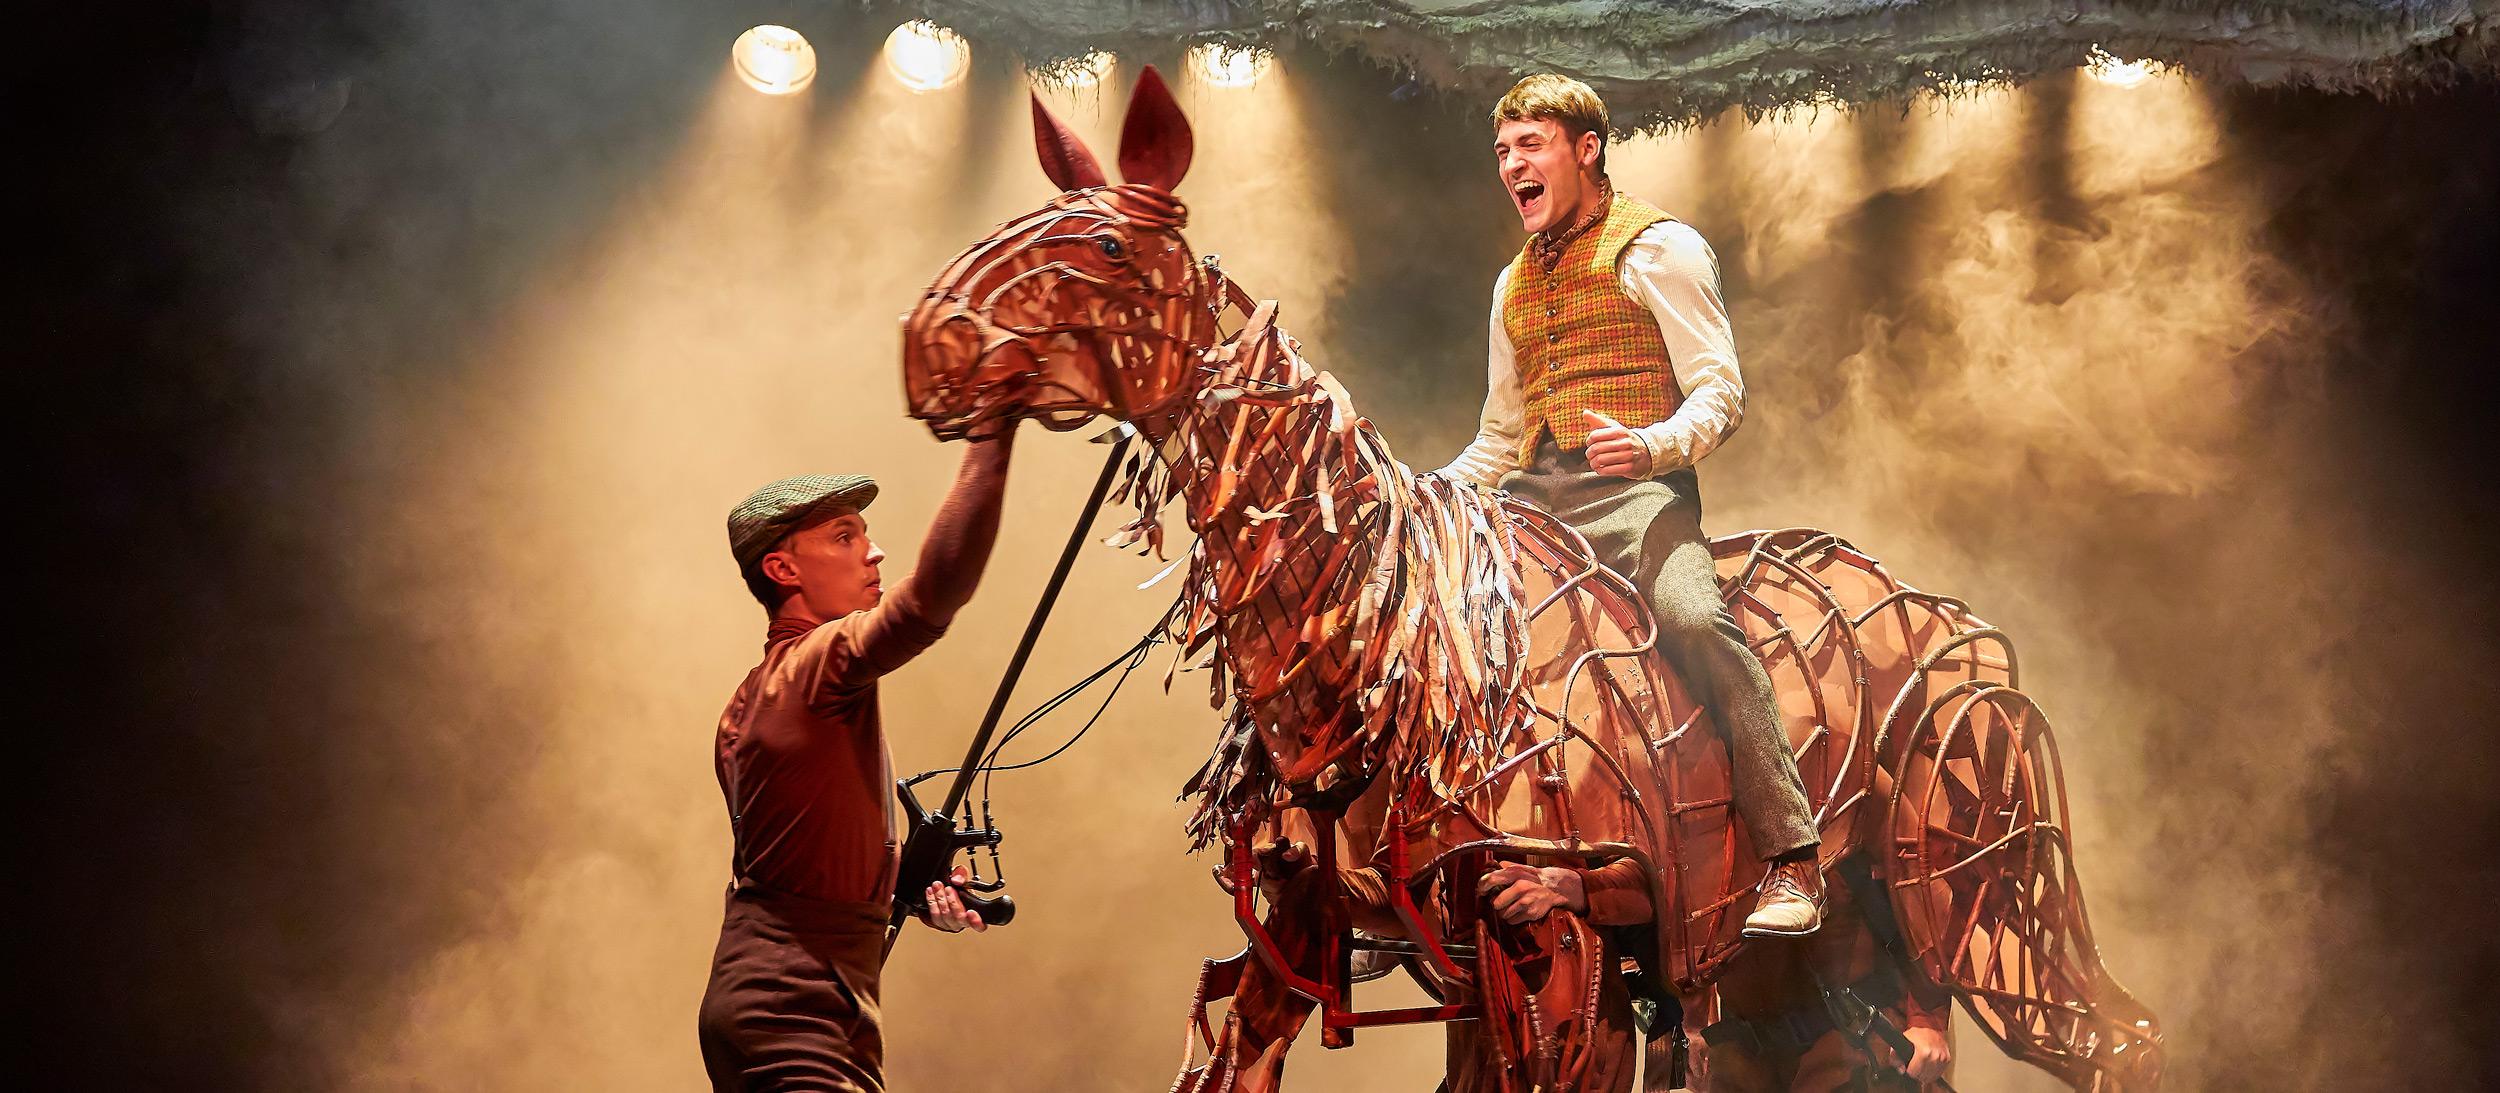 War Horse Behind The Scenes